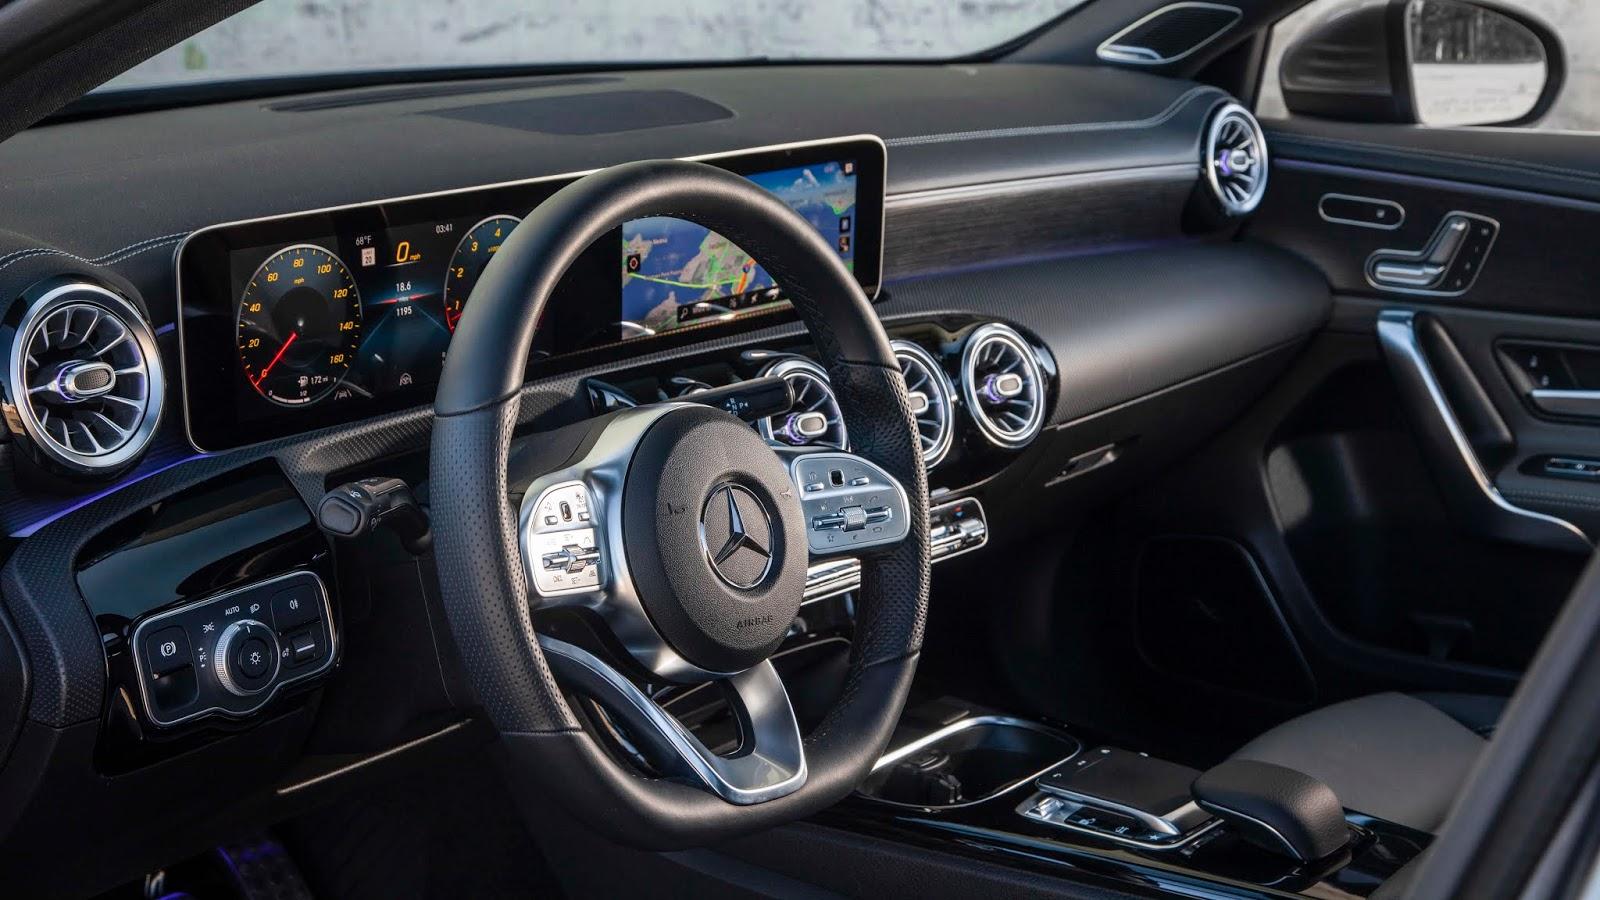 18C0777 015 1 Από 28.230 ευρώ η τιμή της Mercedes A-Class Sedan Luxury sedan, Mercedes, Mercedes AMG, premium sedan, sedan, zblog, καινούργιο, καινούρια, τιμες